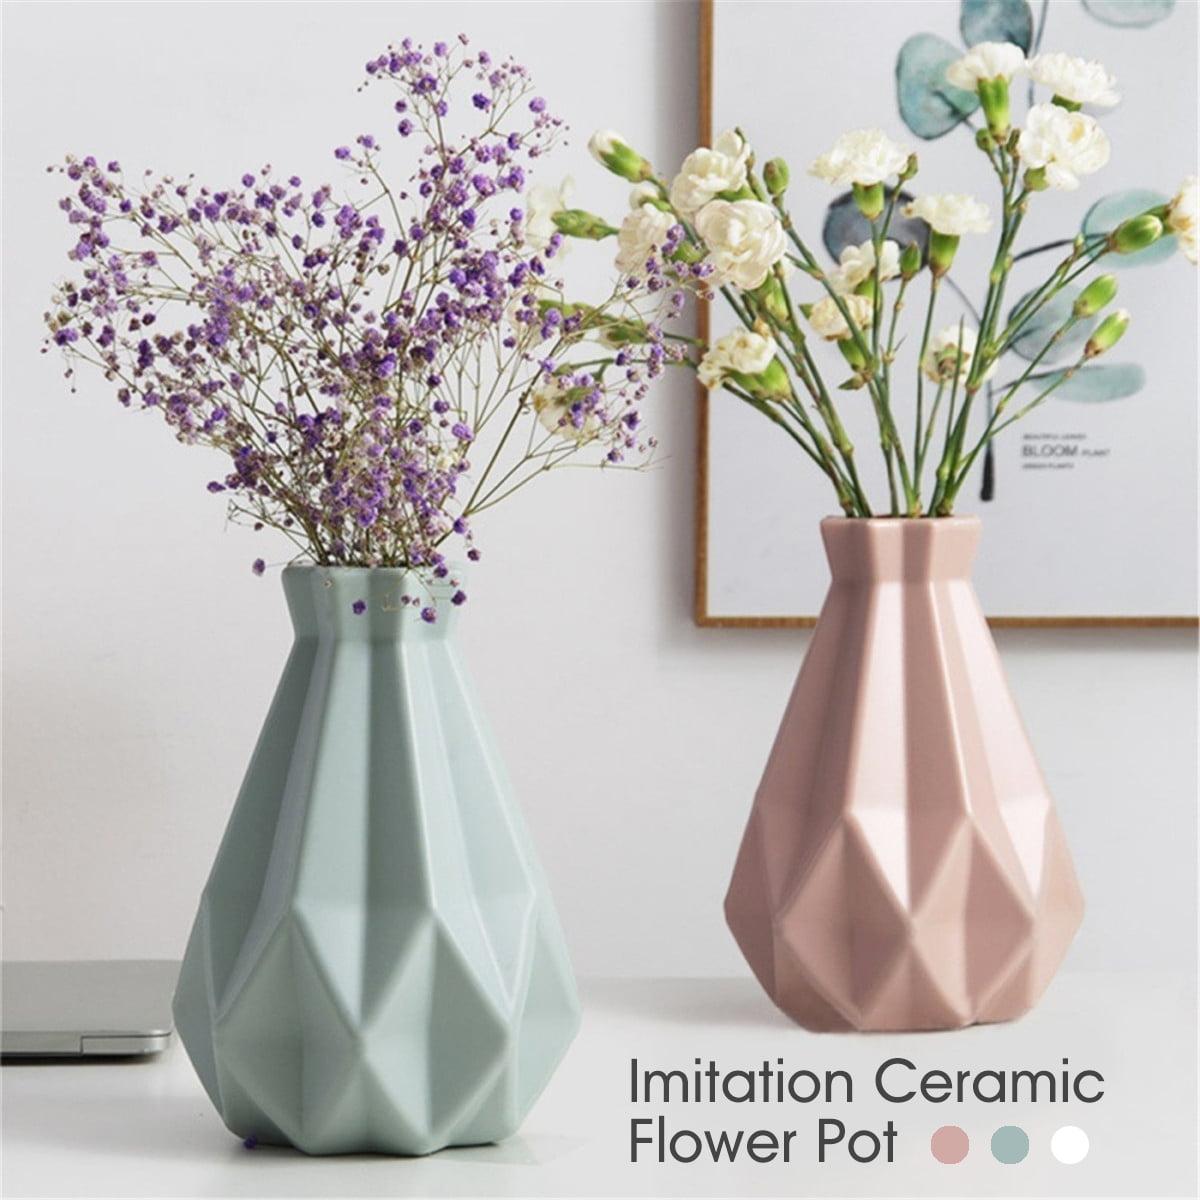 Origami Baskets Vase Imitation Ceramic Plastic Flower Pot Home Decoration Decor